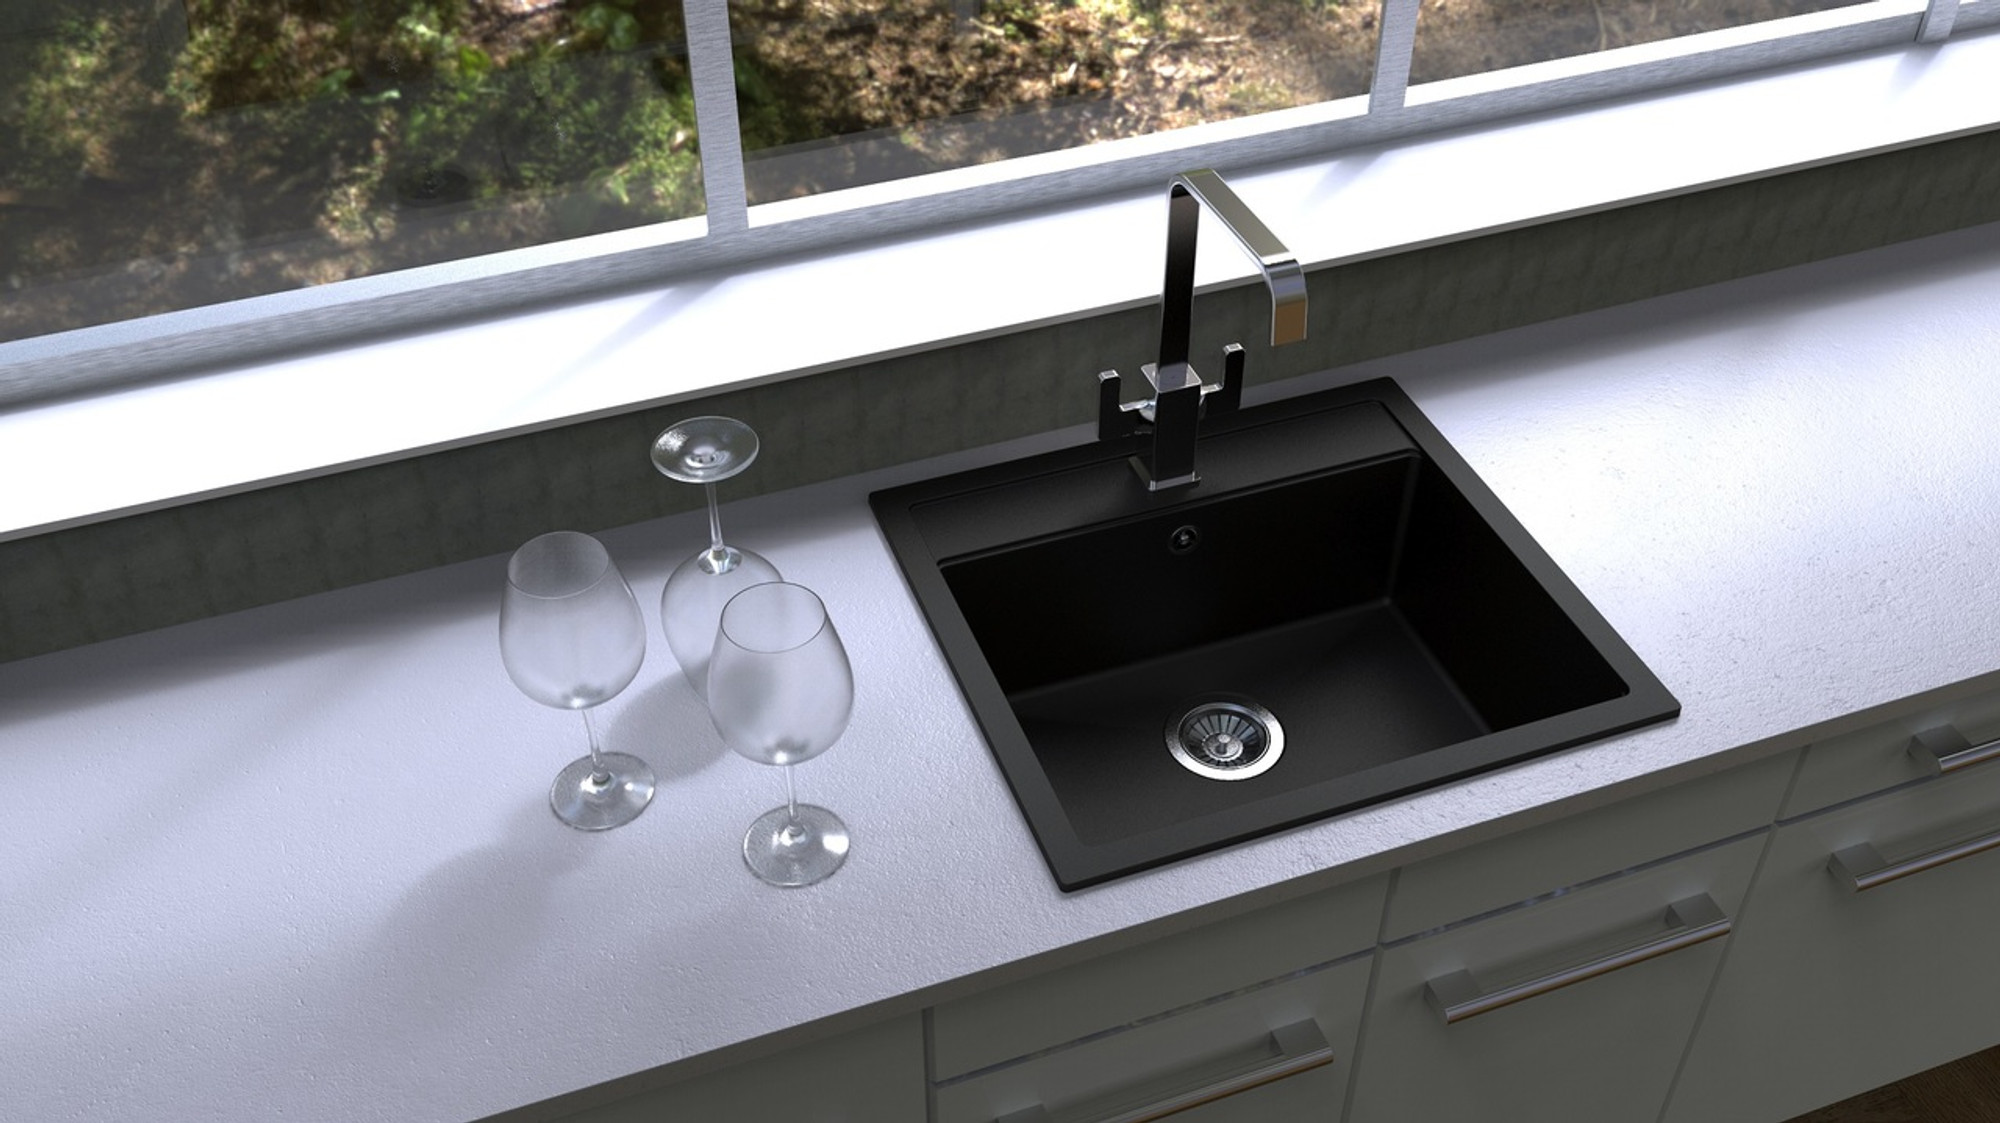 Carysil waltz granite kitchen sink drop in or under mount single bowl 560x510